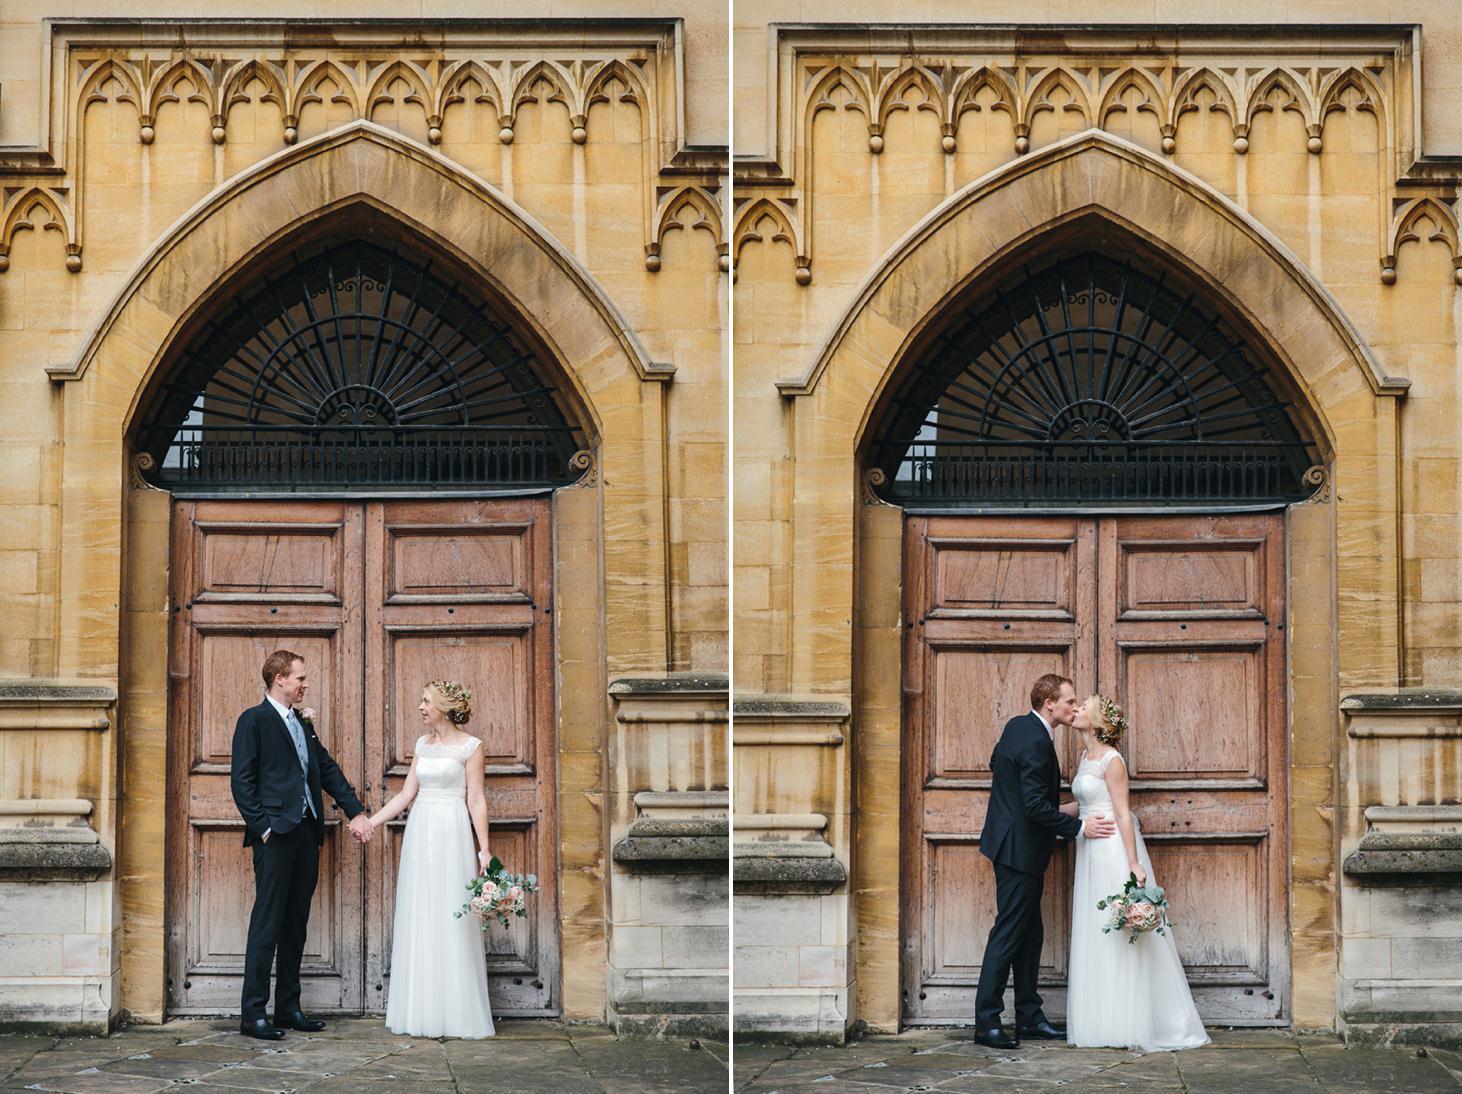 Bodleian library wedding bride and groom by doorway